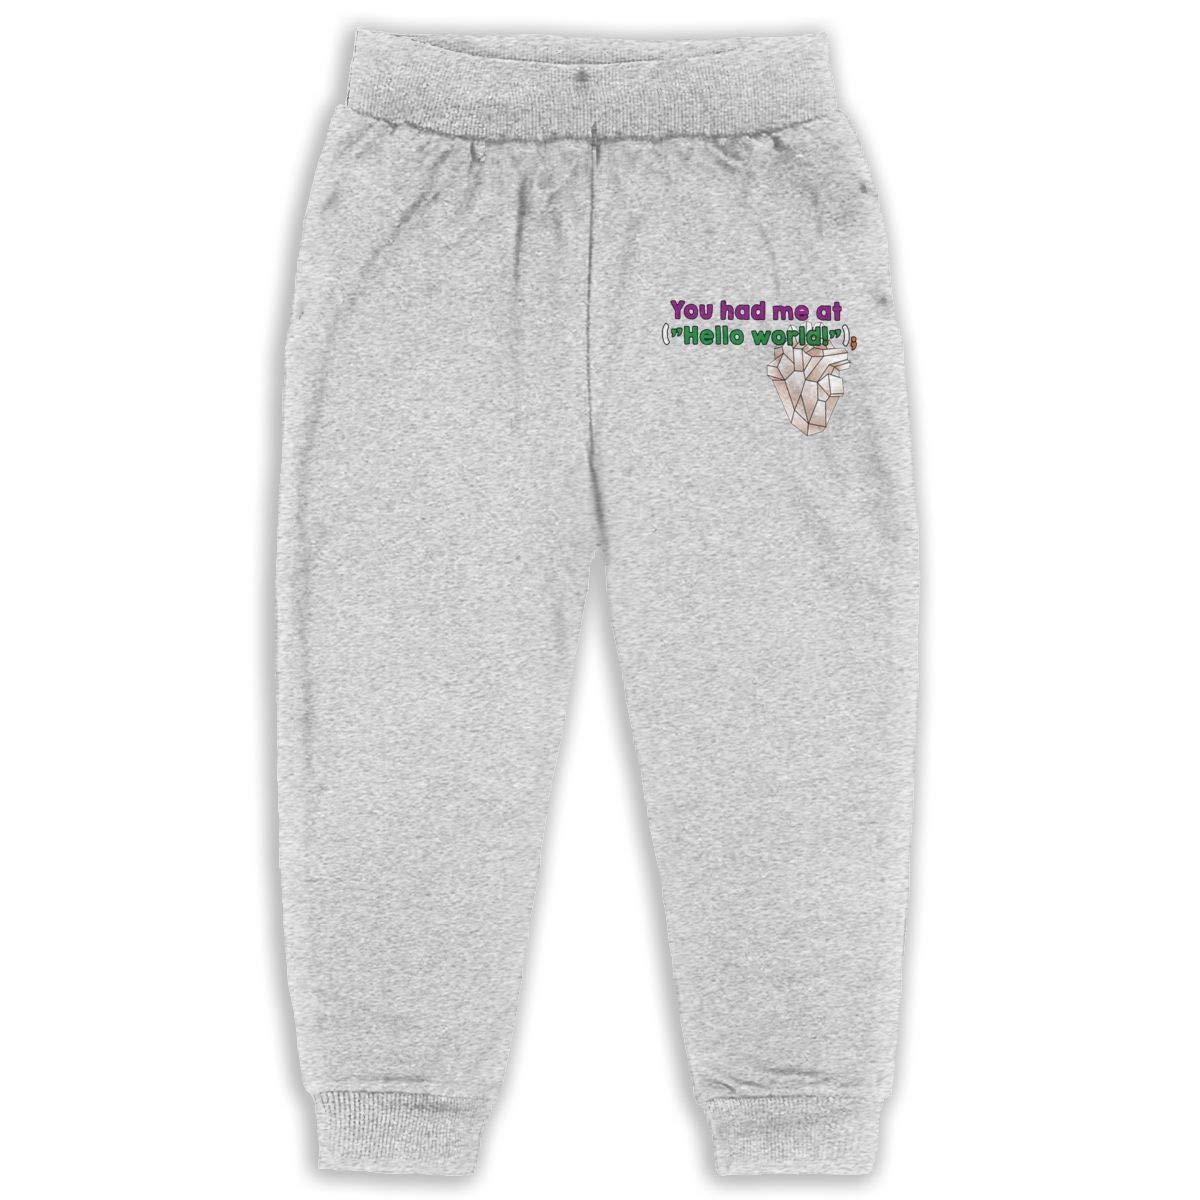 Laoyaotequ You Had Me Kids Cotton Sweatpants,Jogger Long Jersey Sweatpants